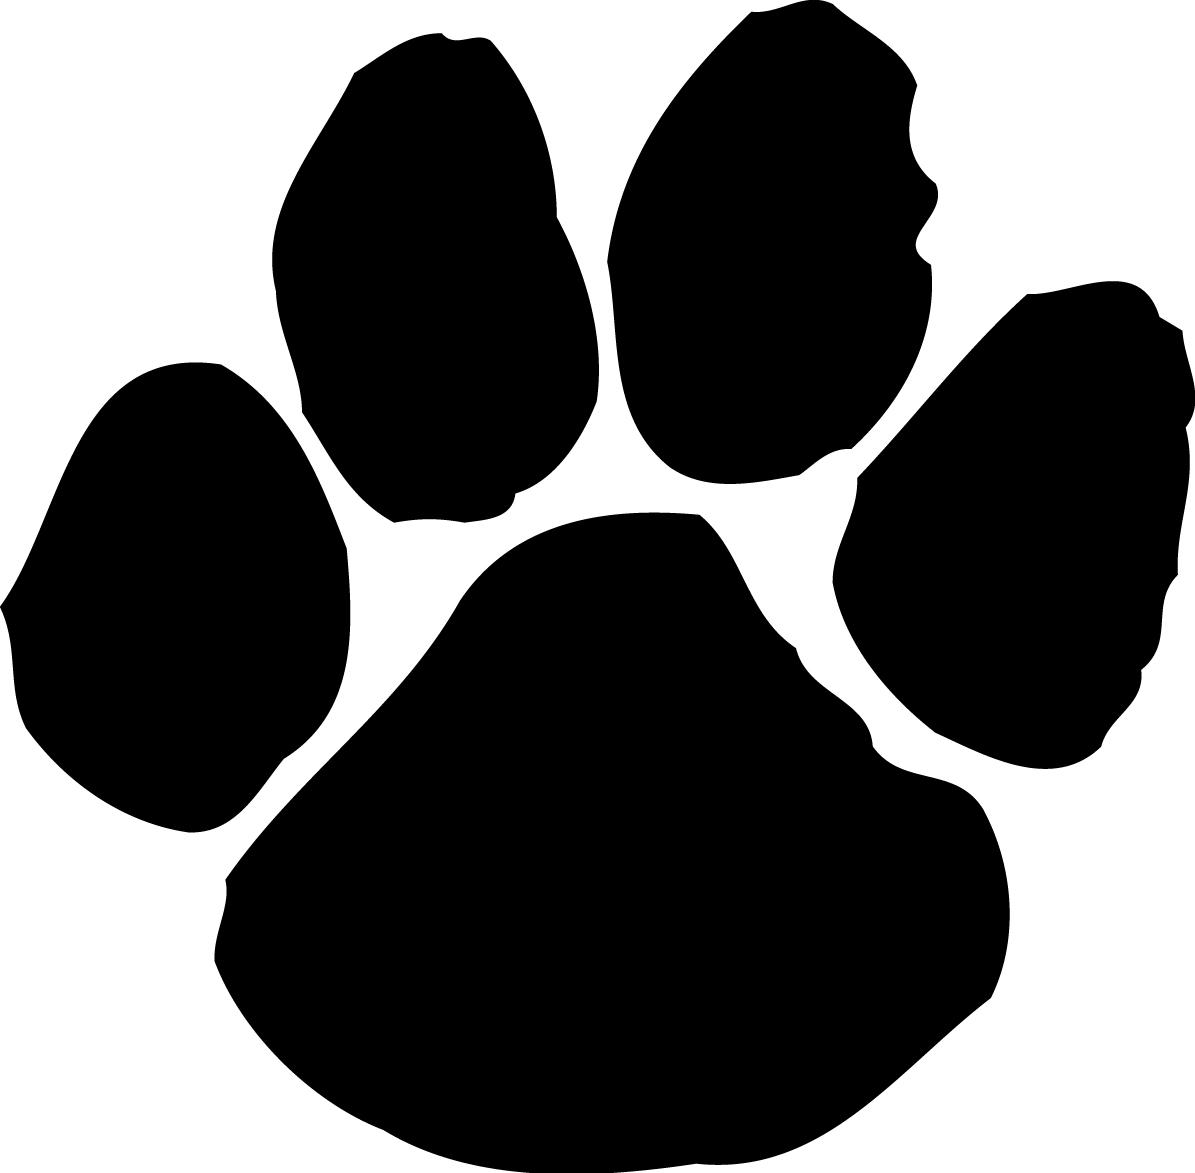 Clip Art Dog Paw Print - ClipArt Best